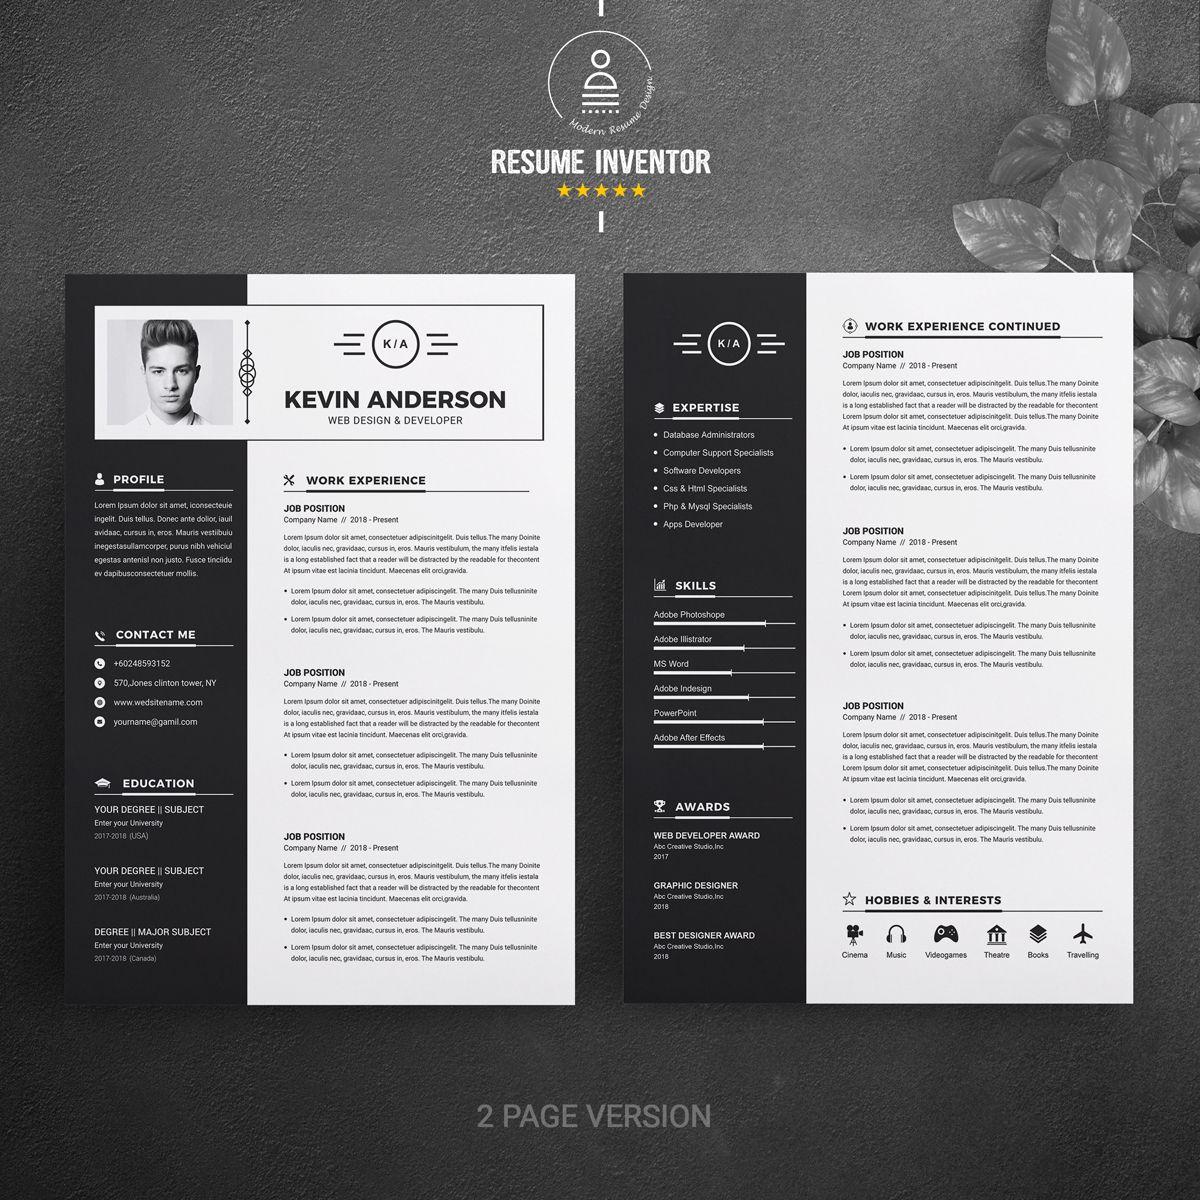 Kevin anderson resume template 74619 resume design